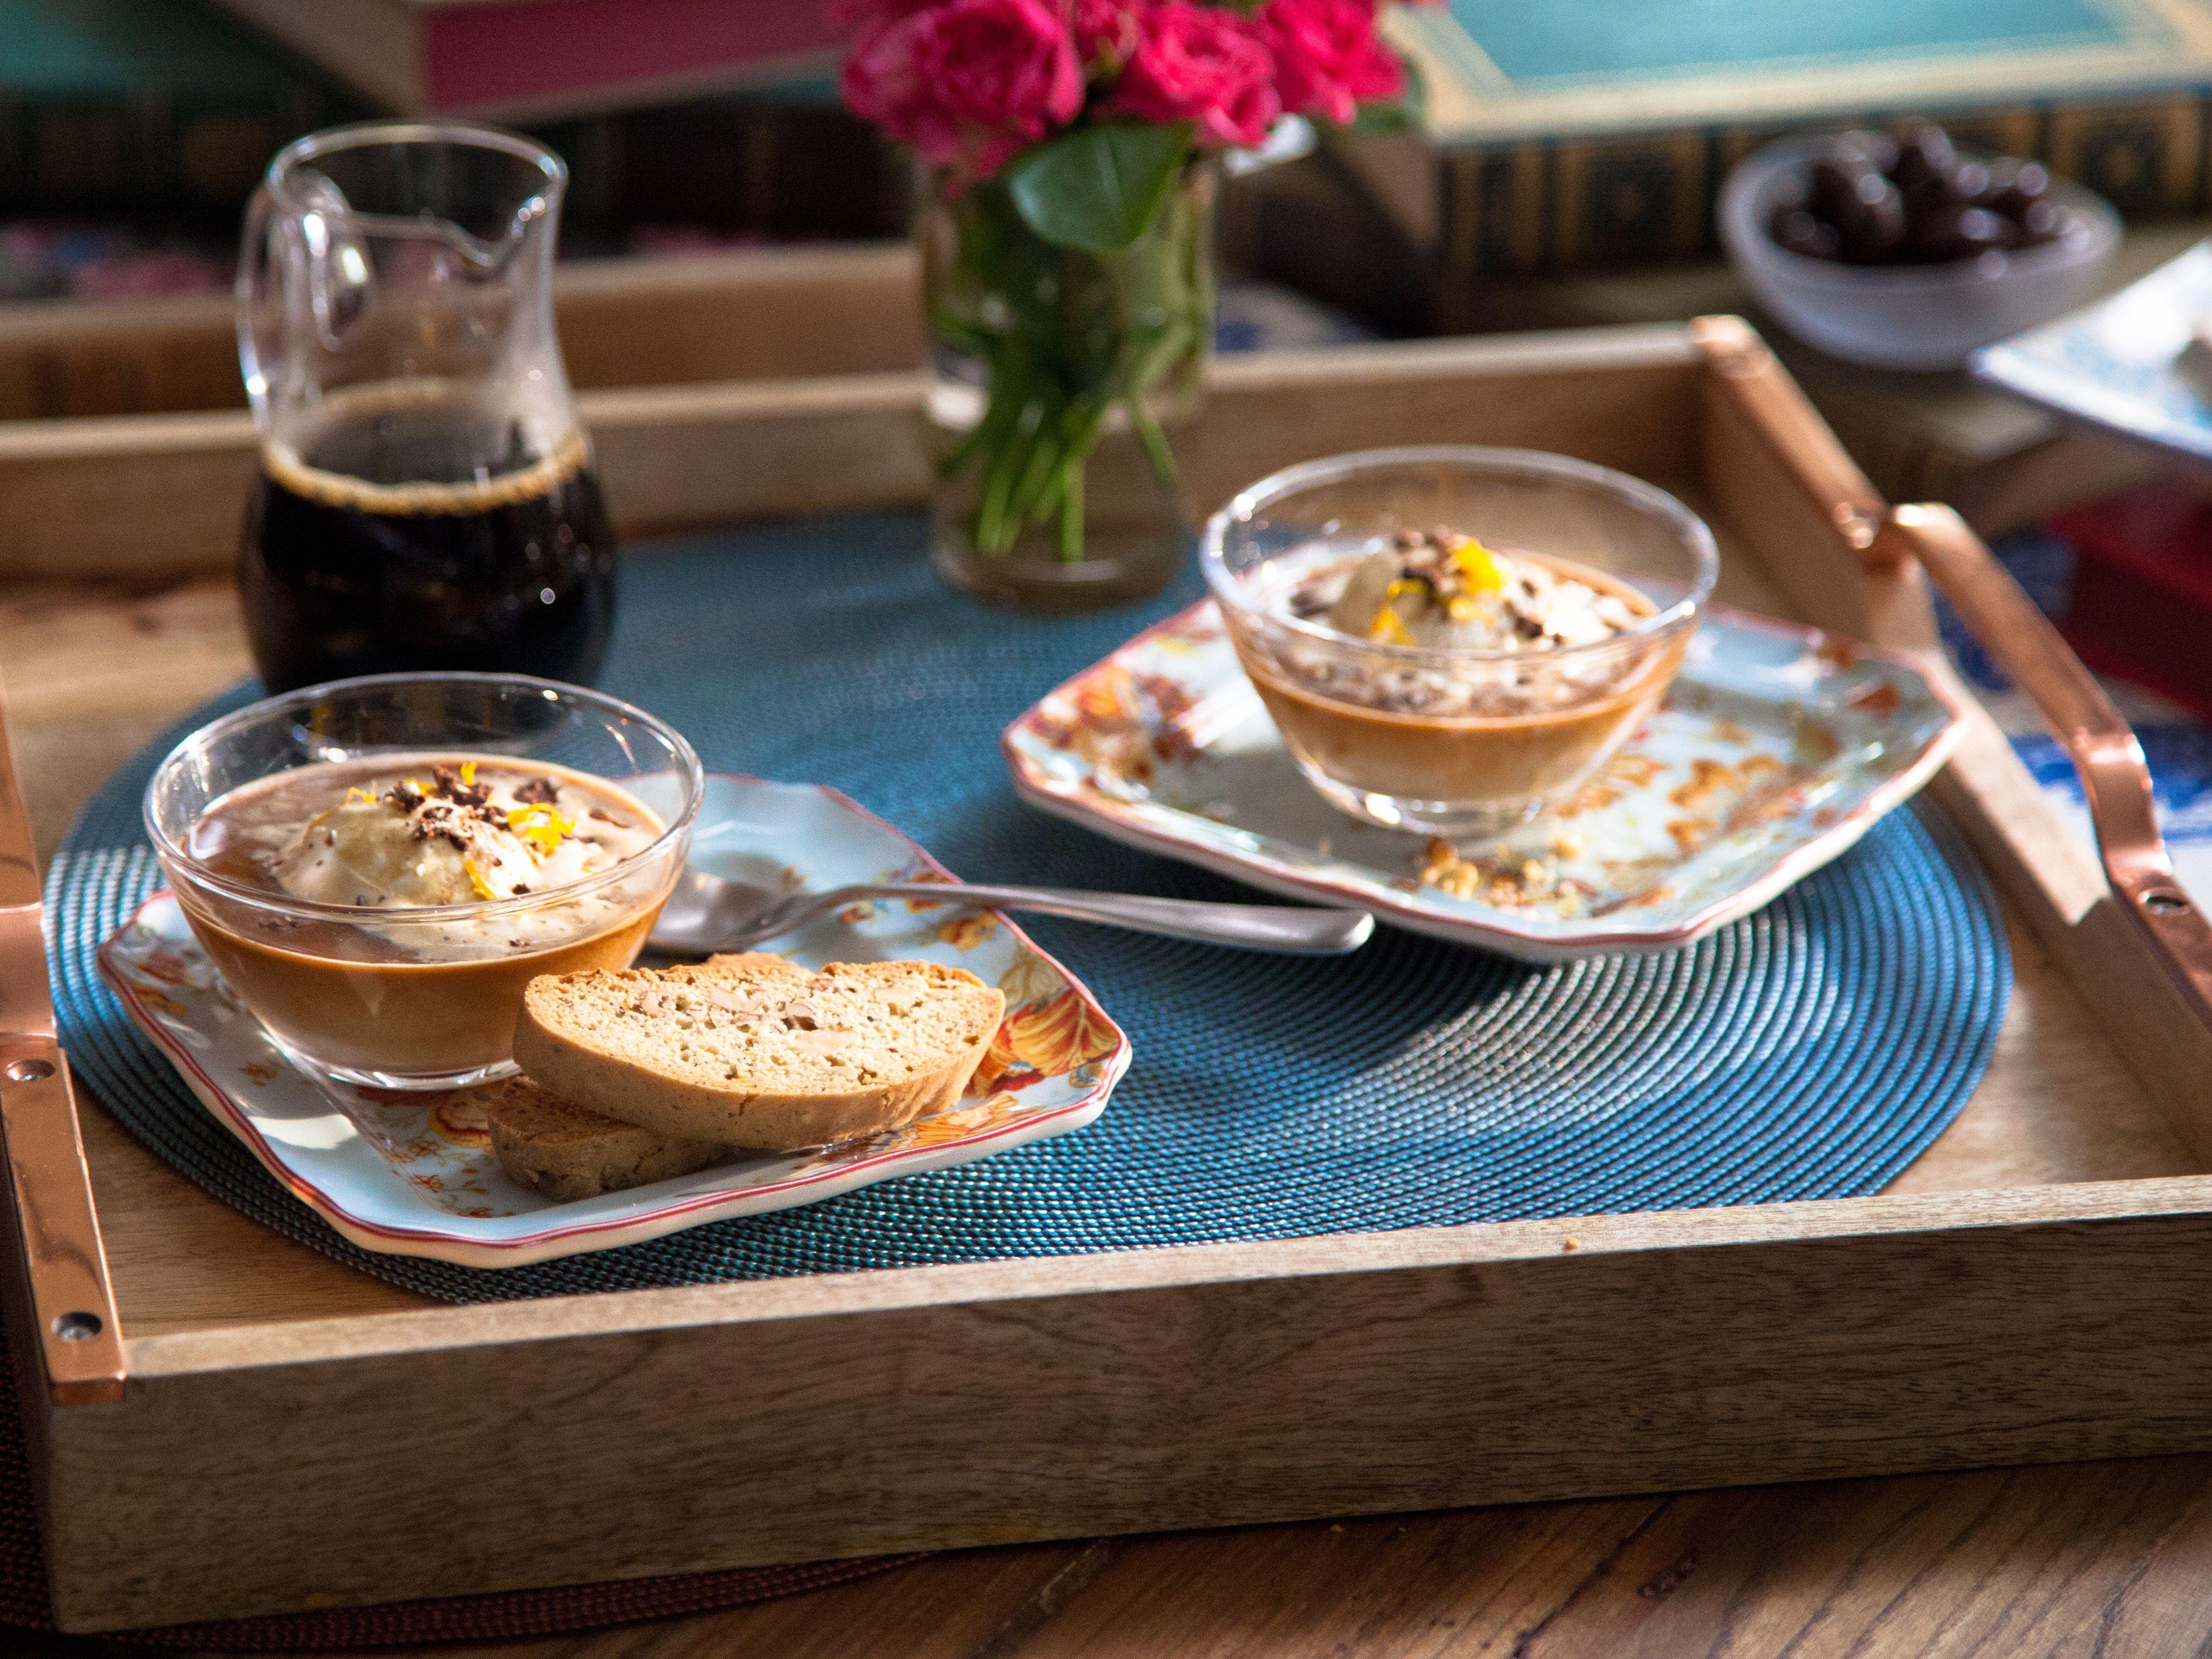 Helens black pepper walnut biscotti recipe valerie bertinelli food network forumfinder Images